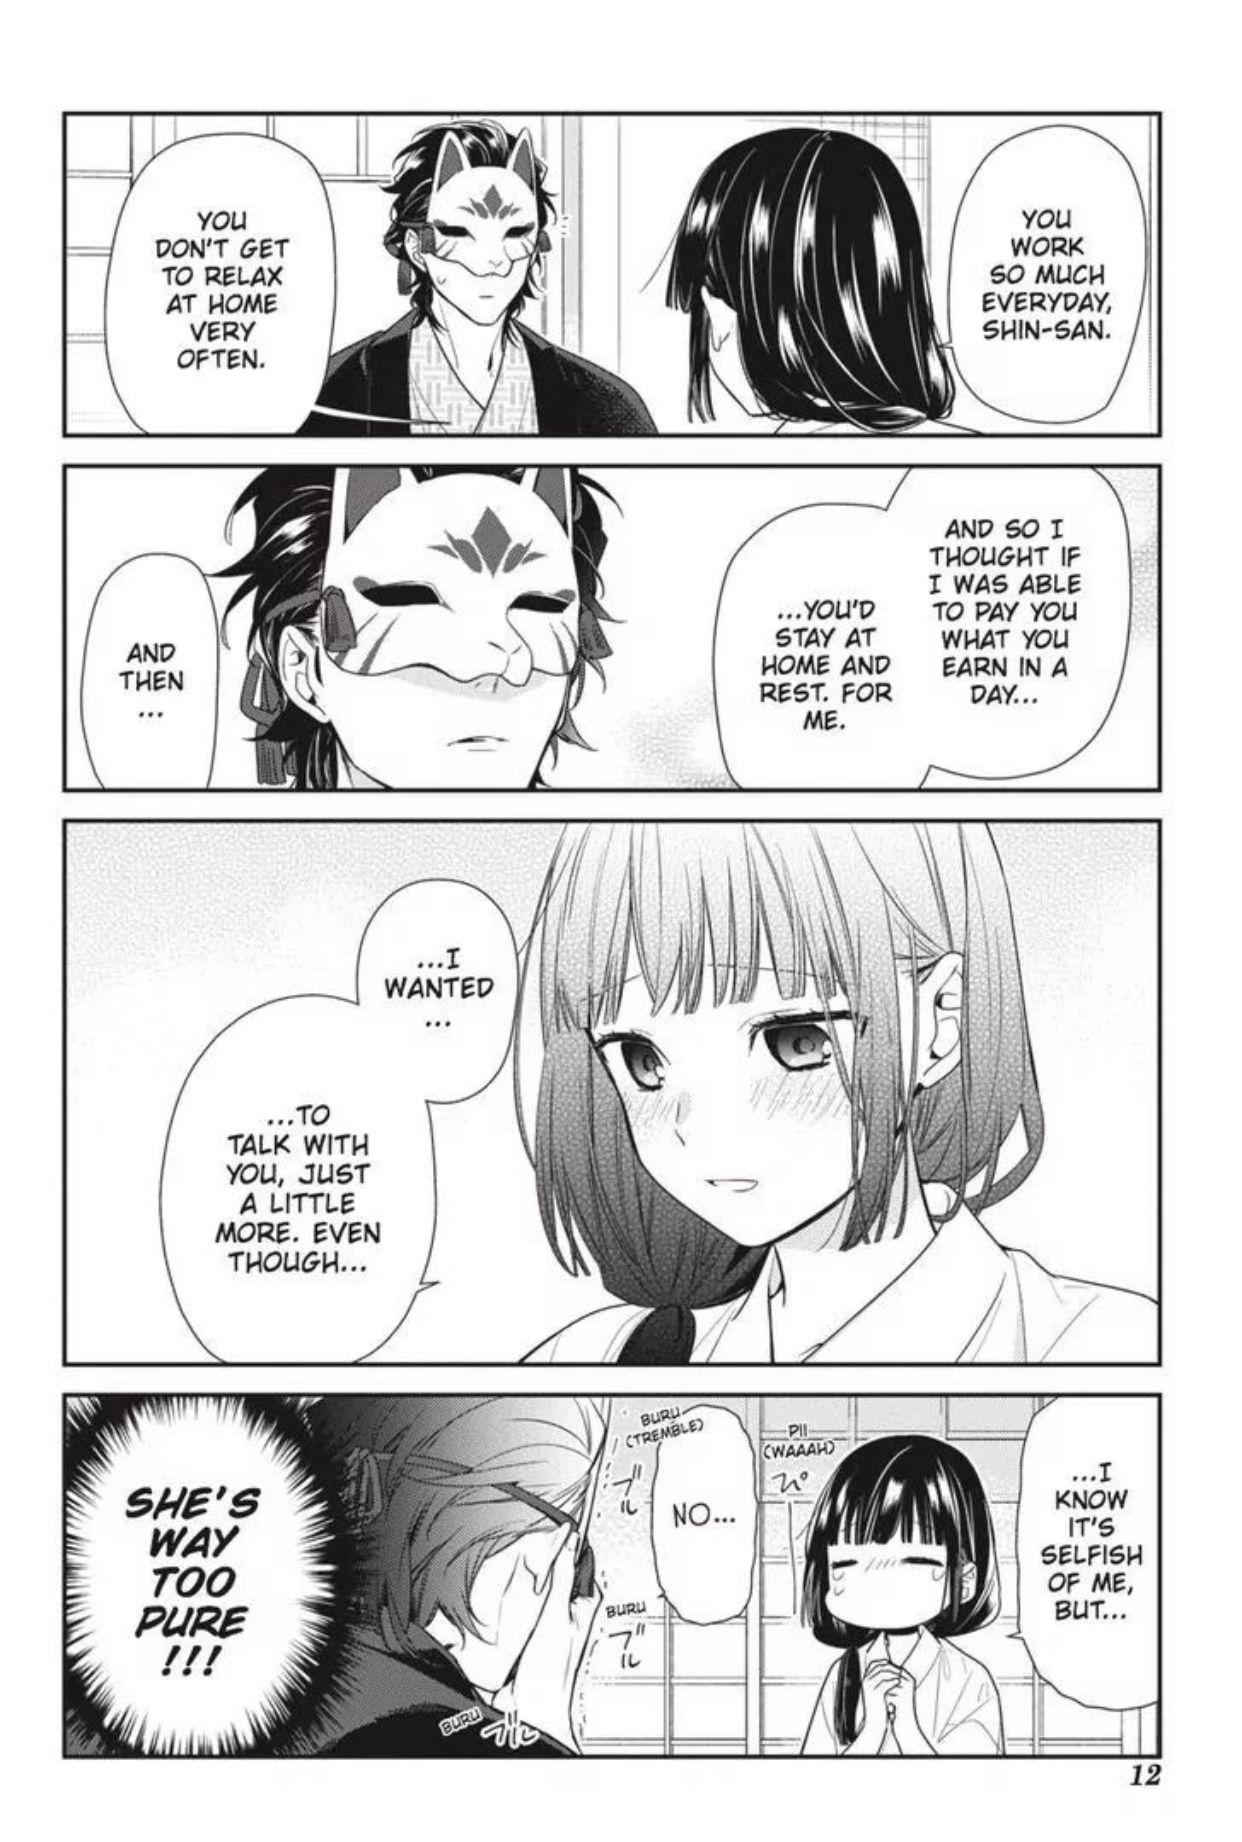 Pin by Animemangaluver on Nenene Manga Manga couples